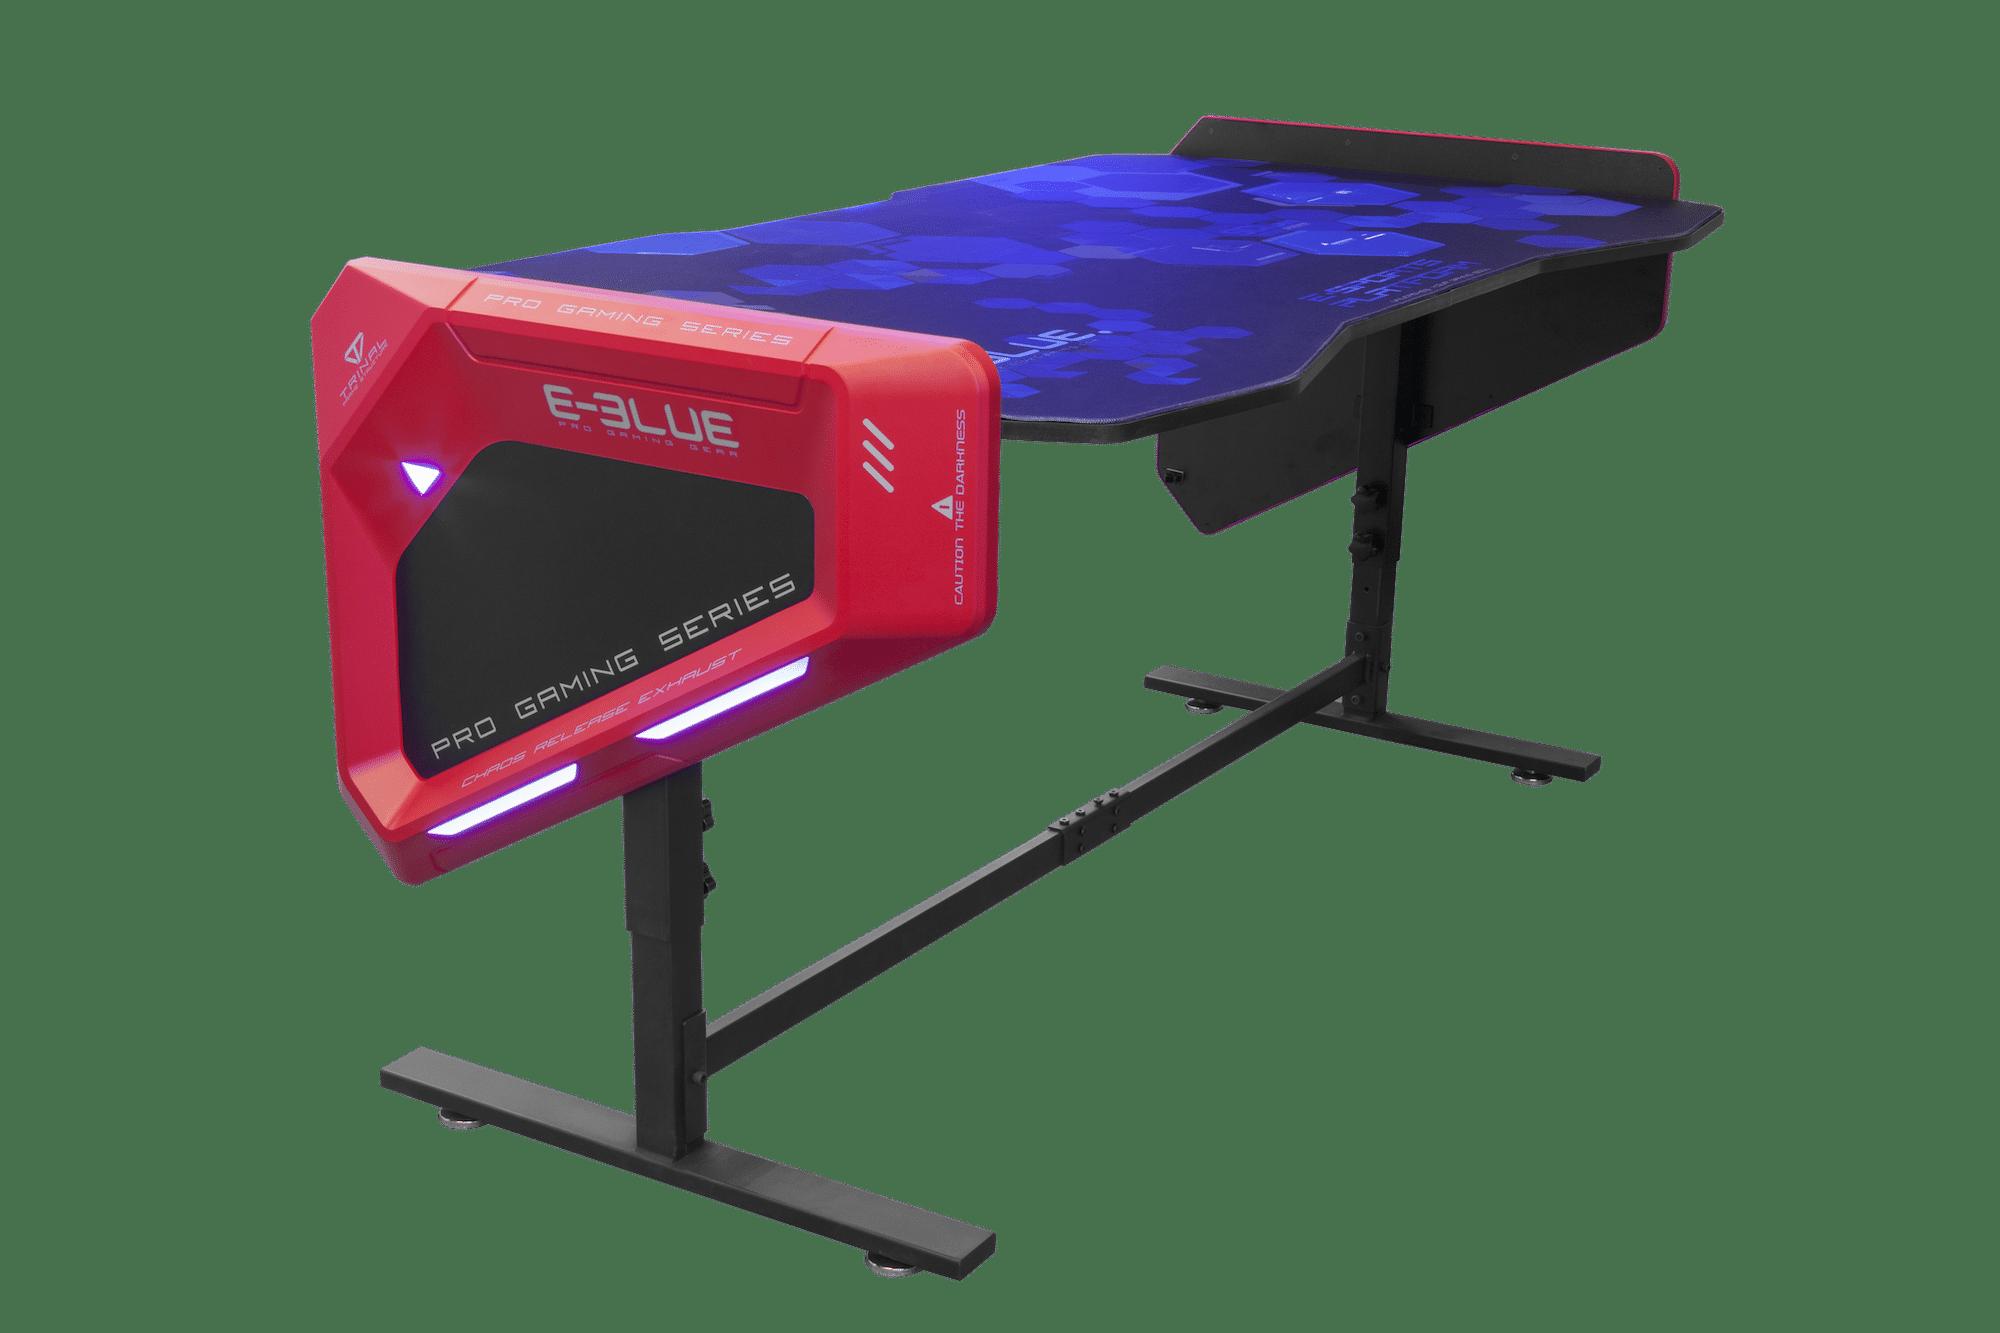 Bureau Gaming Rtro Eclair RGB EGT003 Hauteur